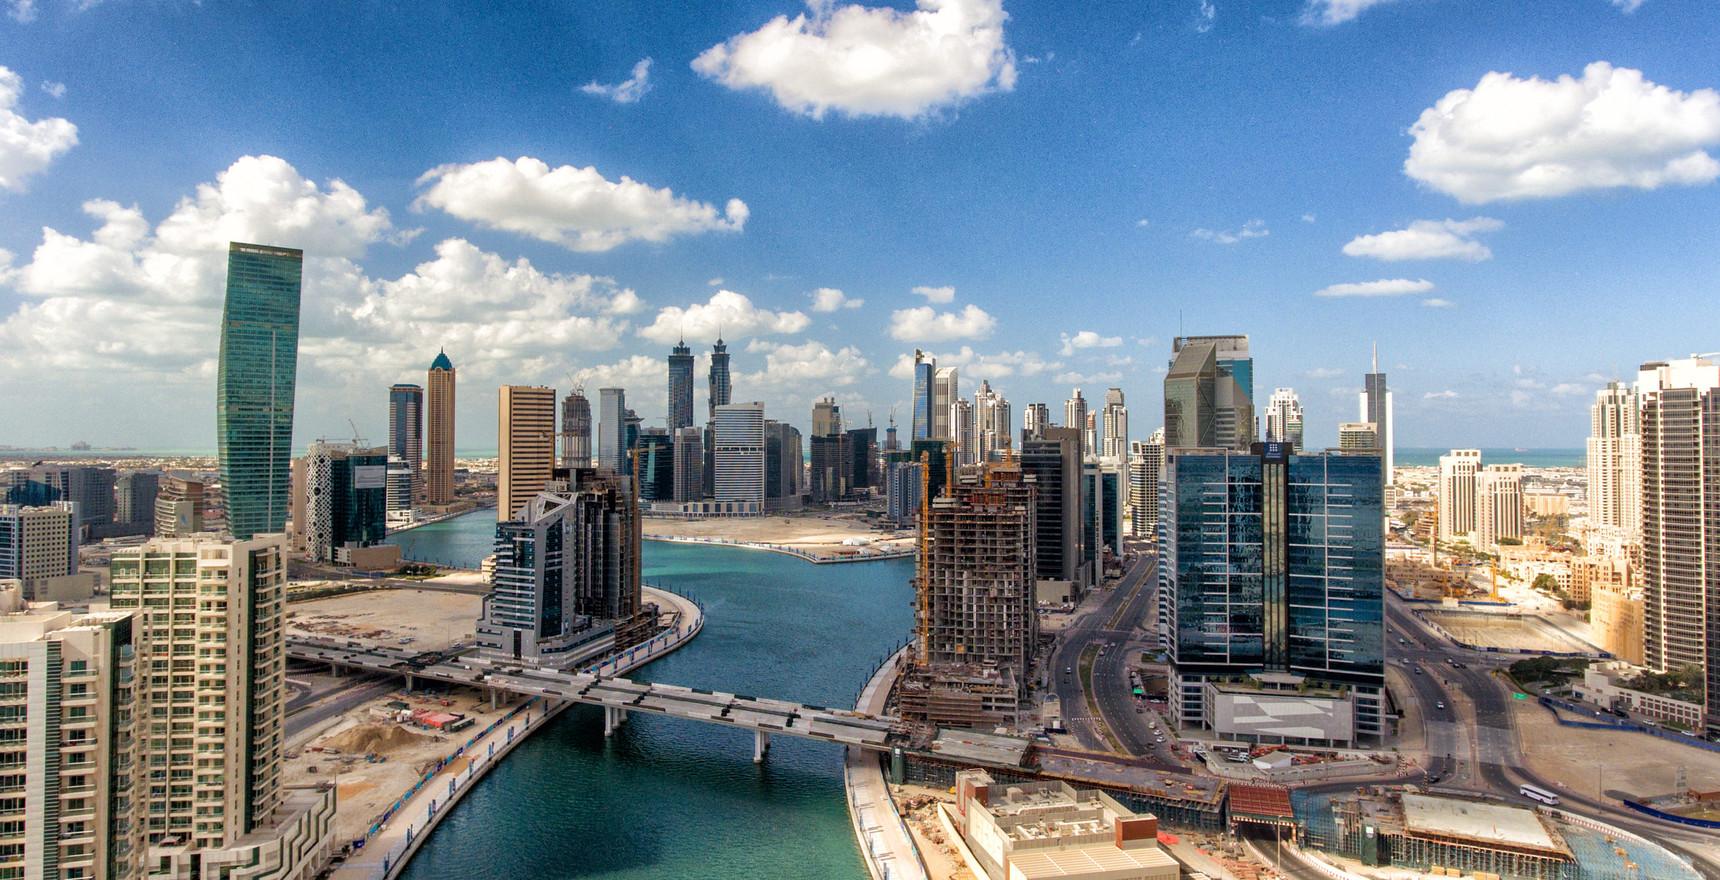 Aerial view of Downtown Dubai skyline, UAE